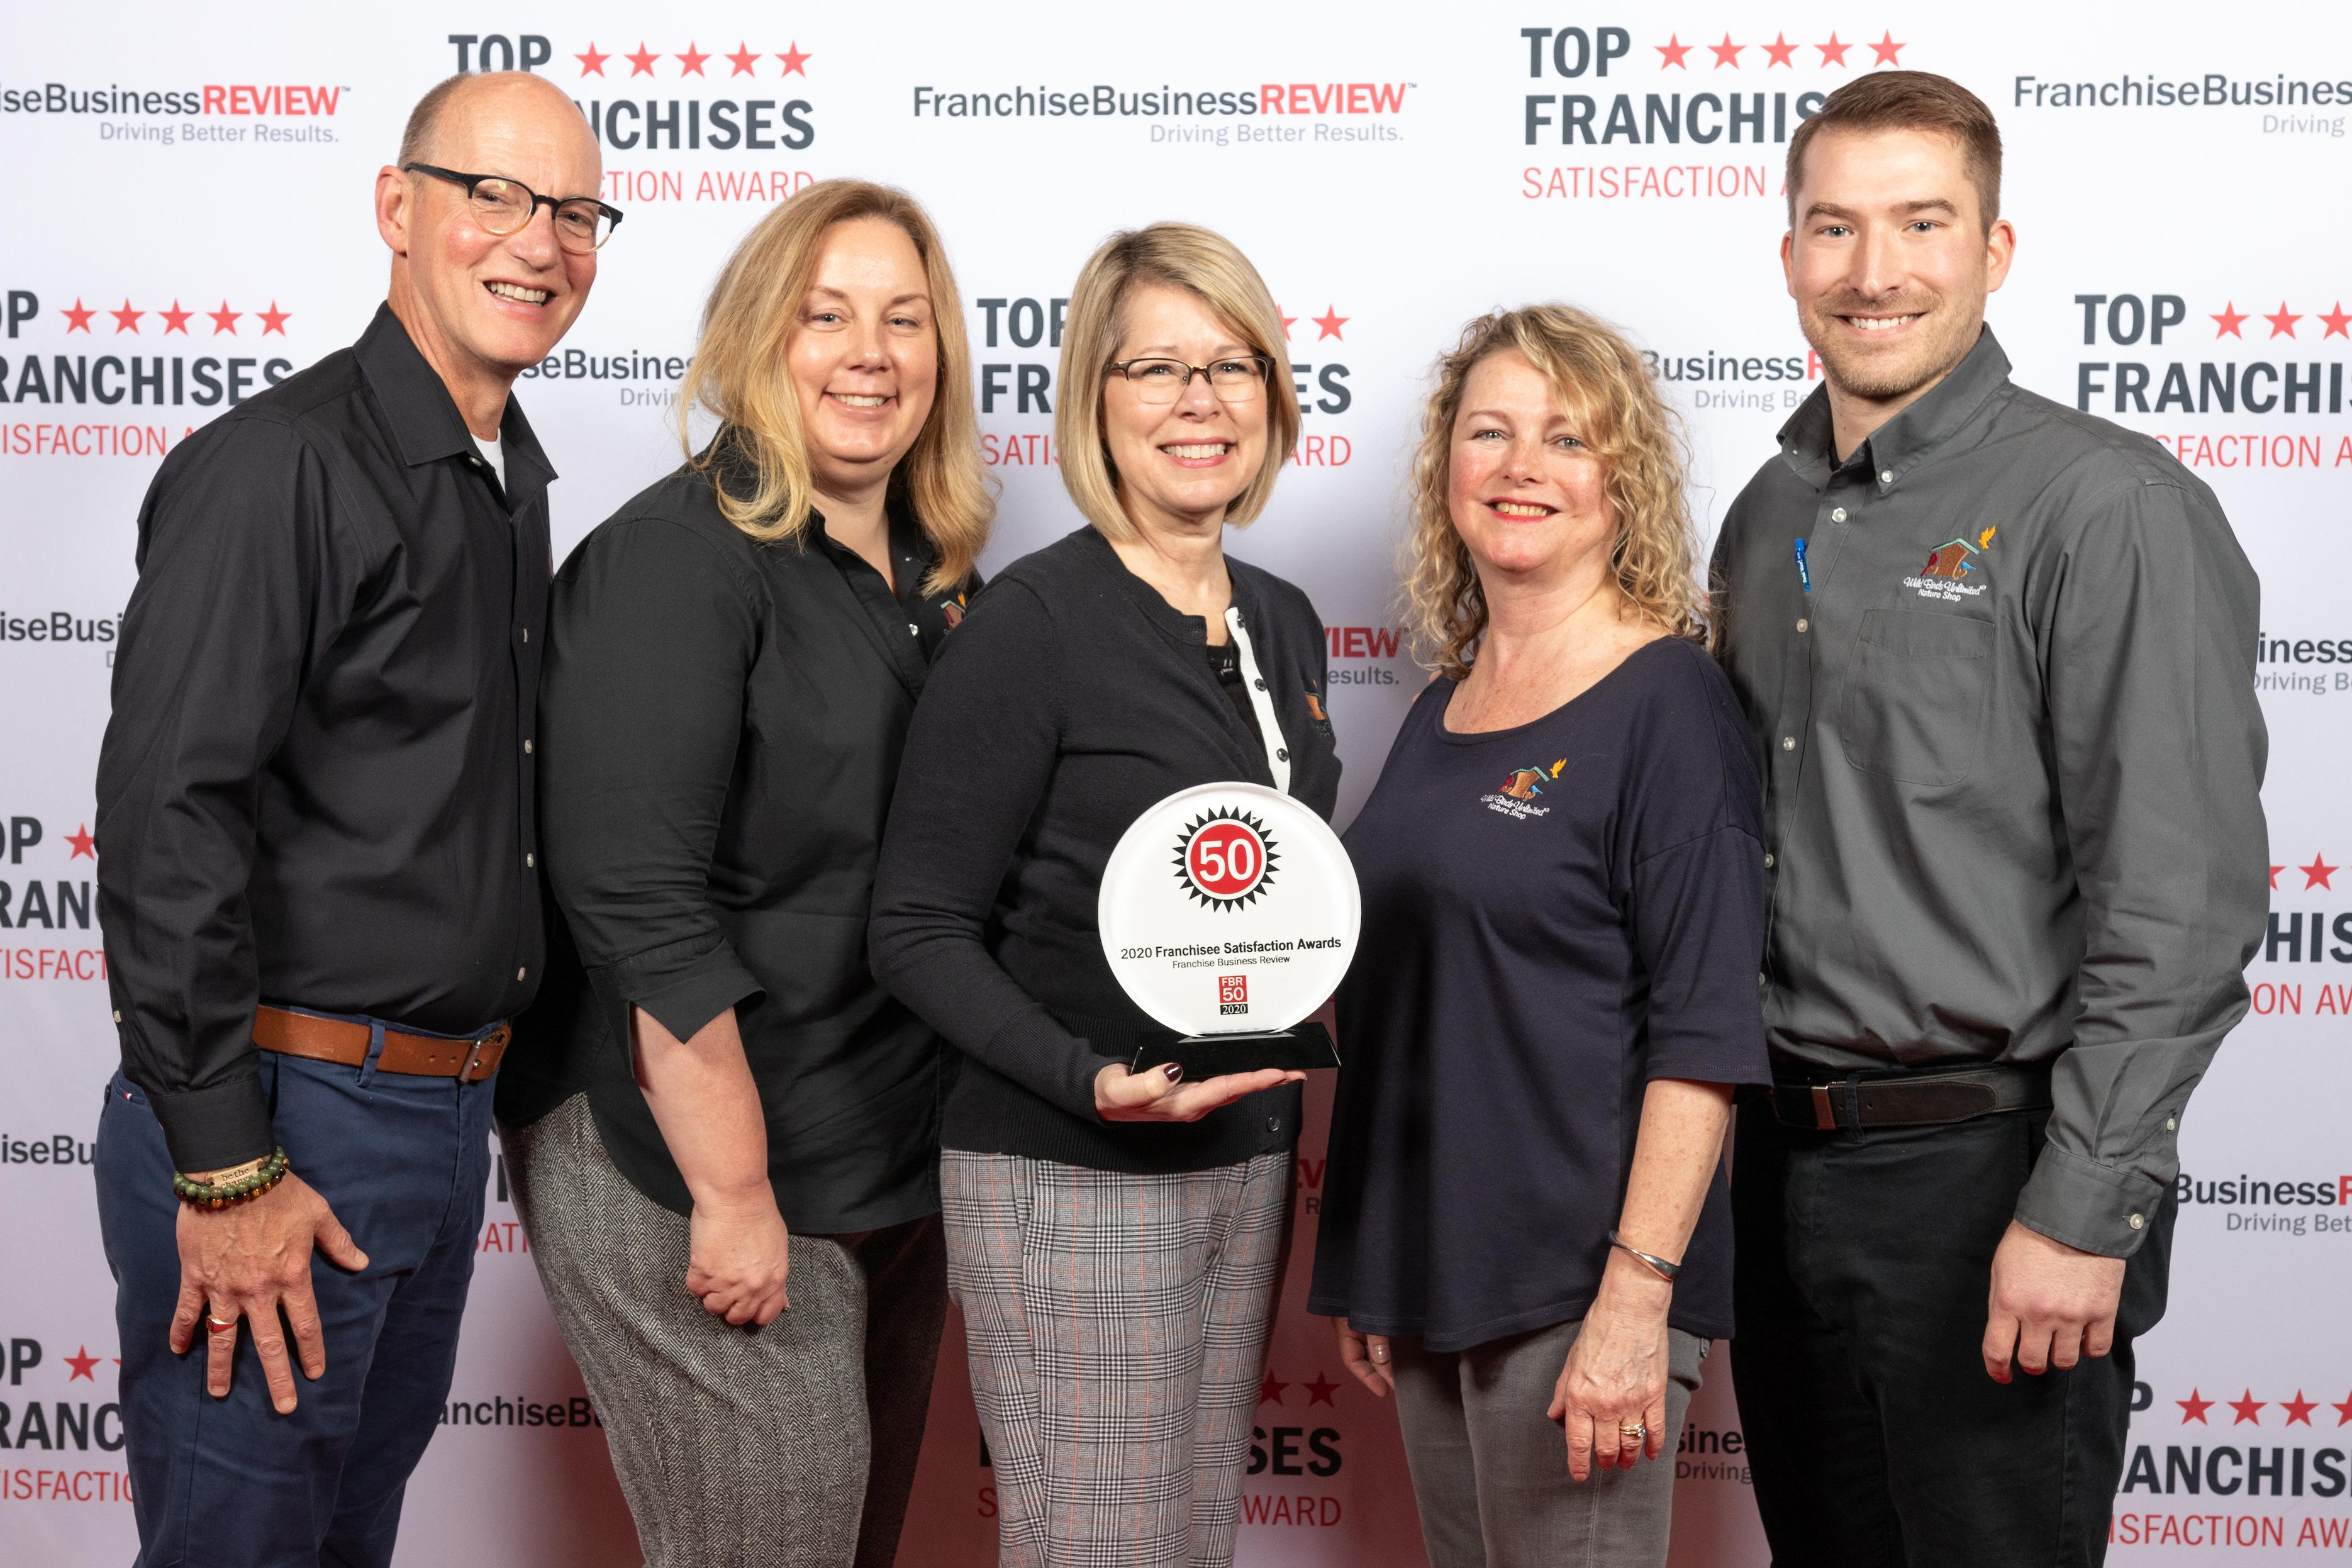 Wild Birds Unlimited team receiving 2020 Top Franchises Award